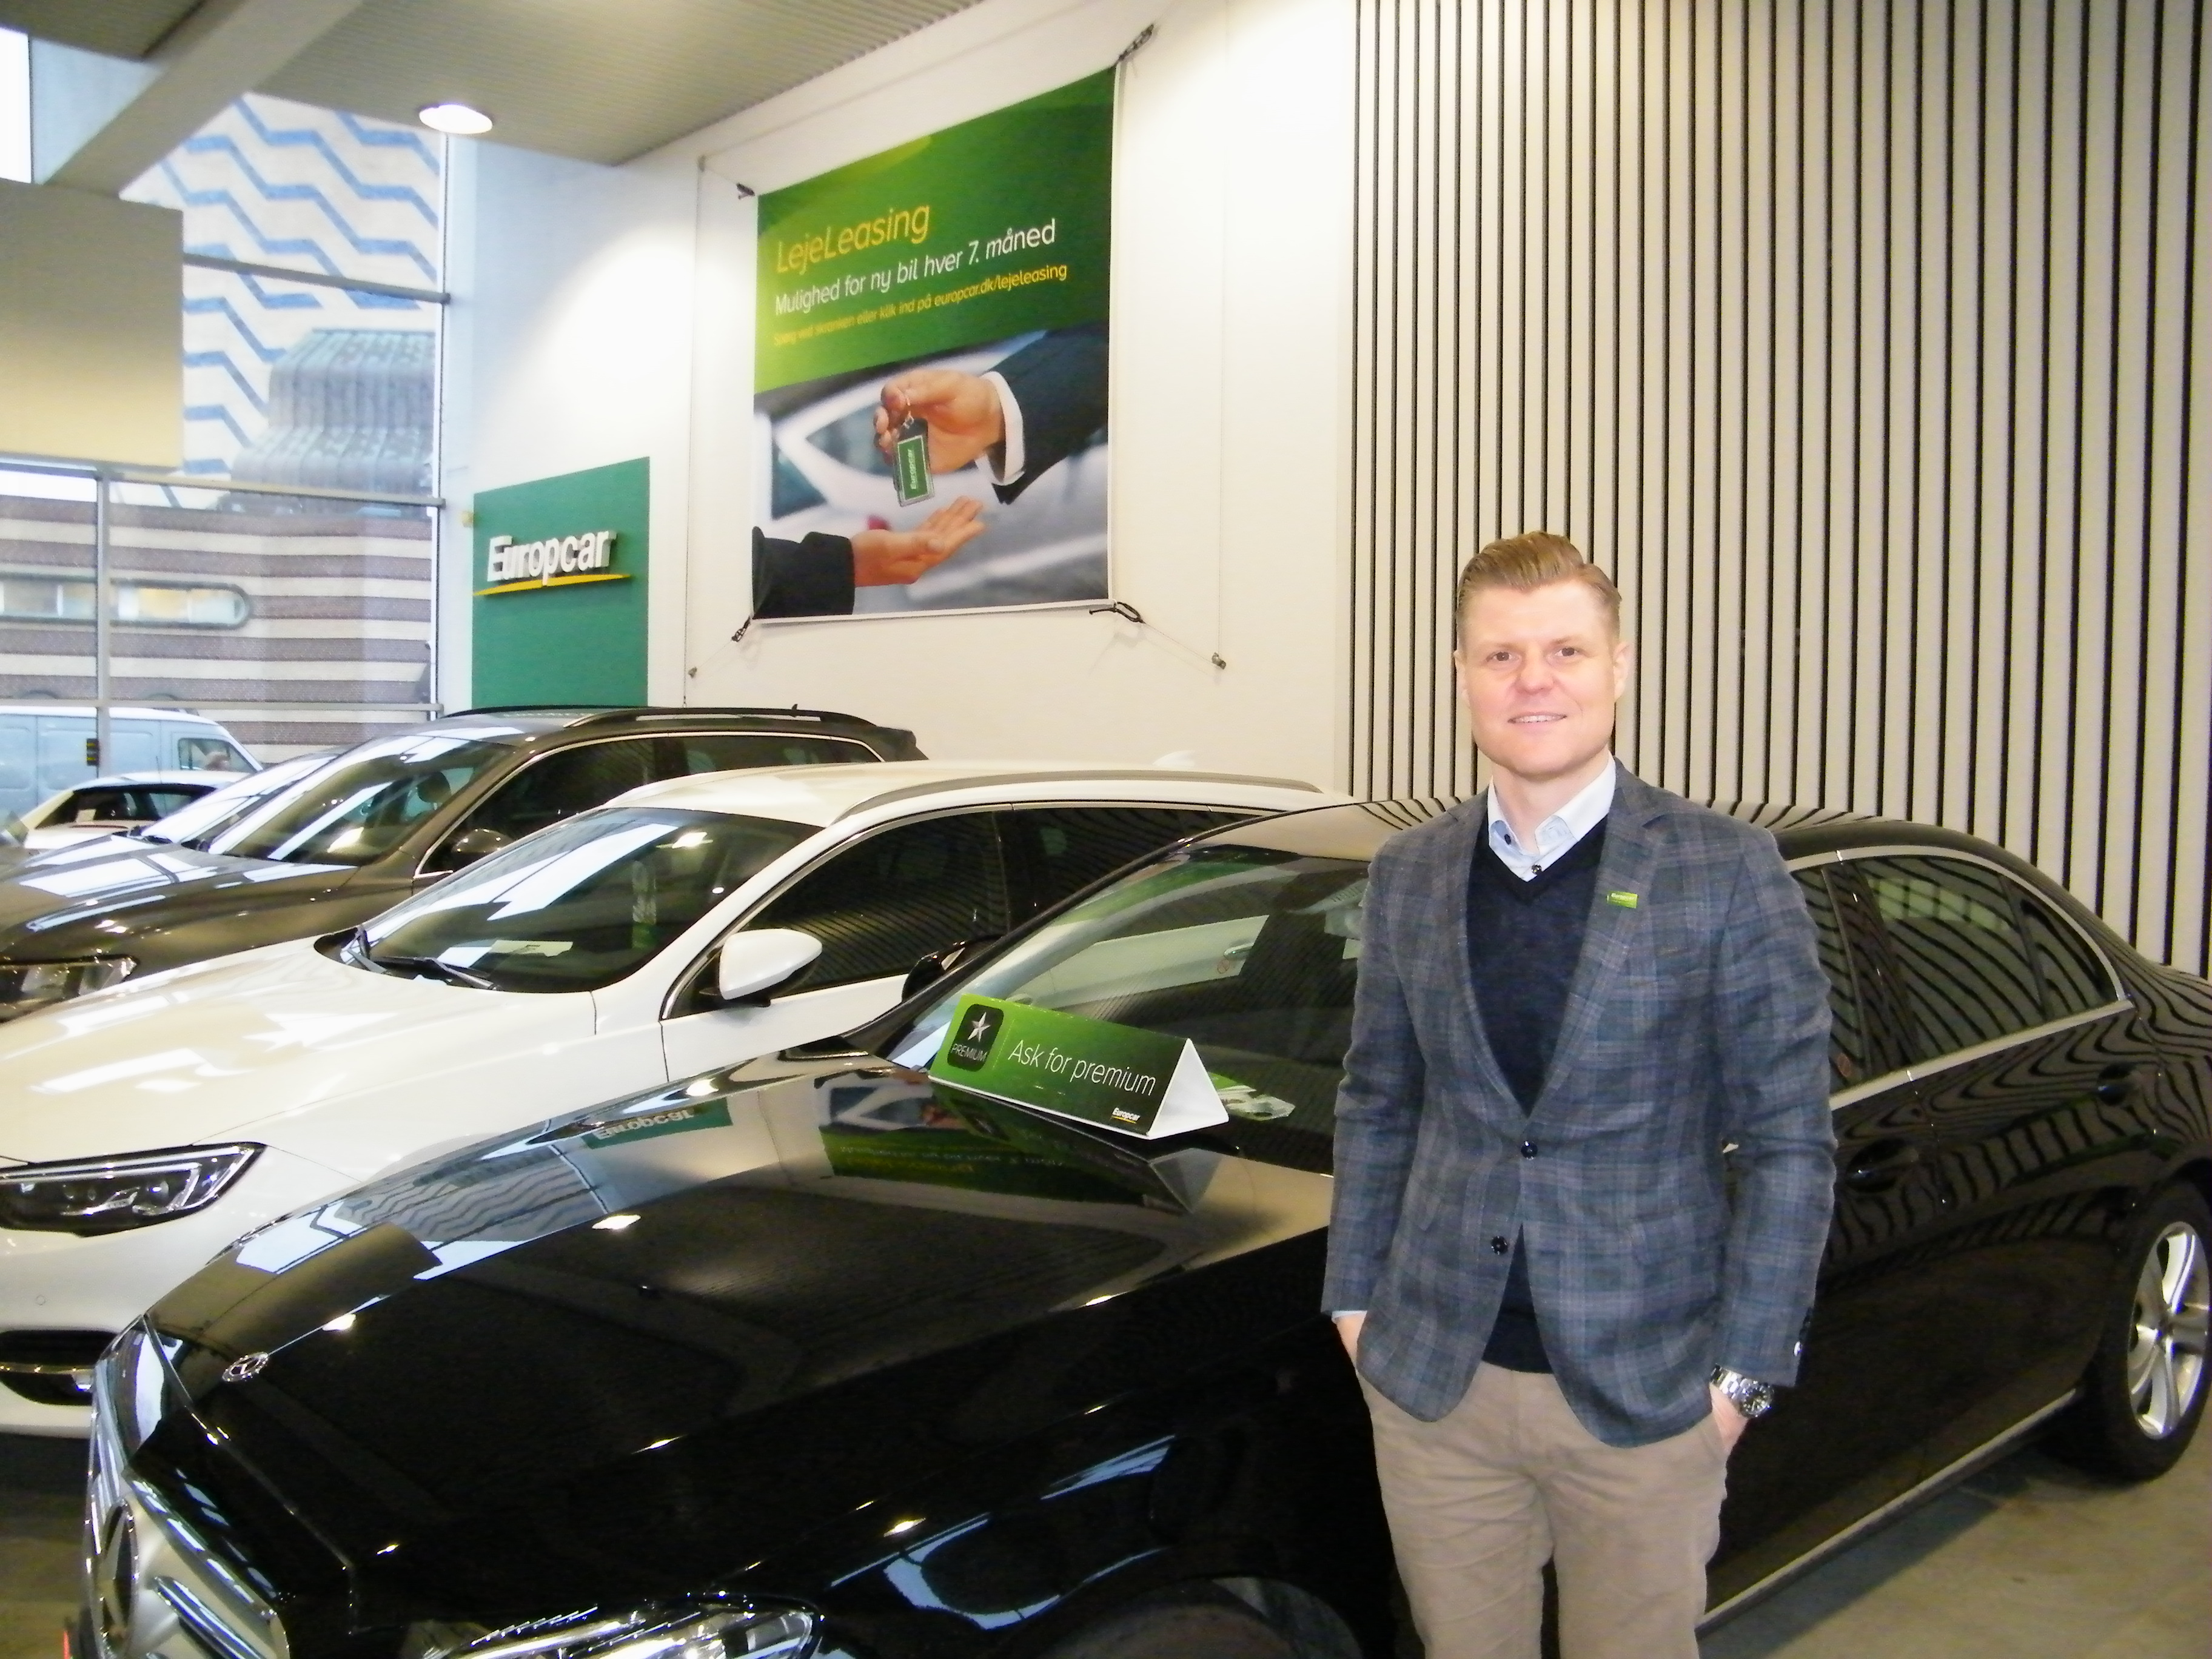 40-årige Christian Øien er ny salgsdirektør hos Europcar i Danmark. Foto: Henrik Baumgarten.